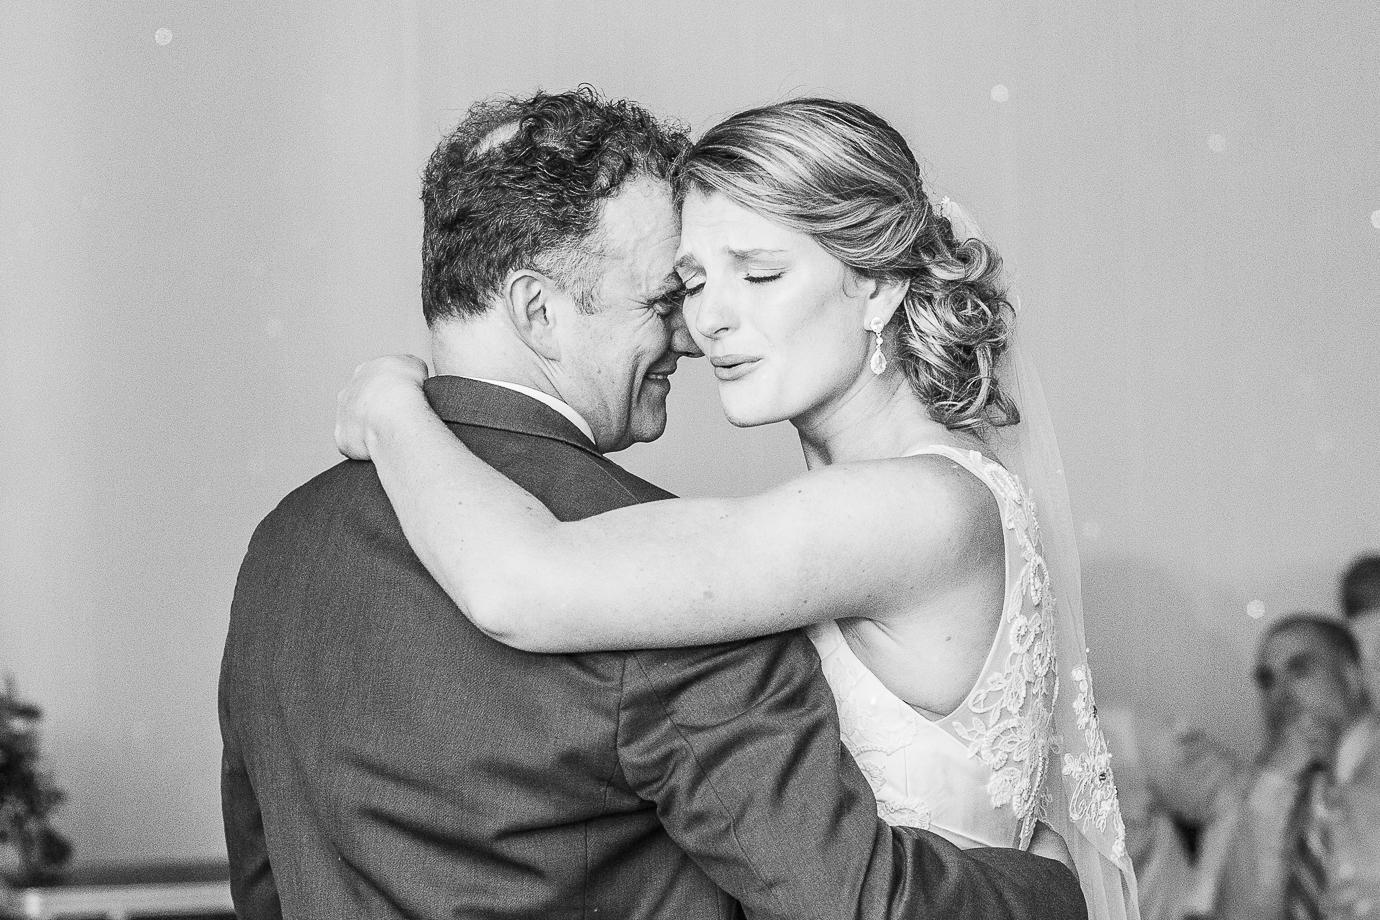 Pennsylvania October Fall Lehigh Valley wedding and lifestyle photographer Lytle Photo Co (152 of 167).jpg